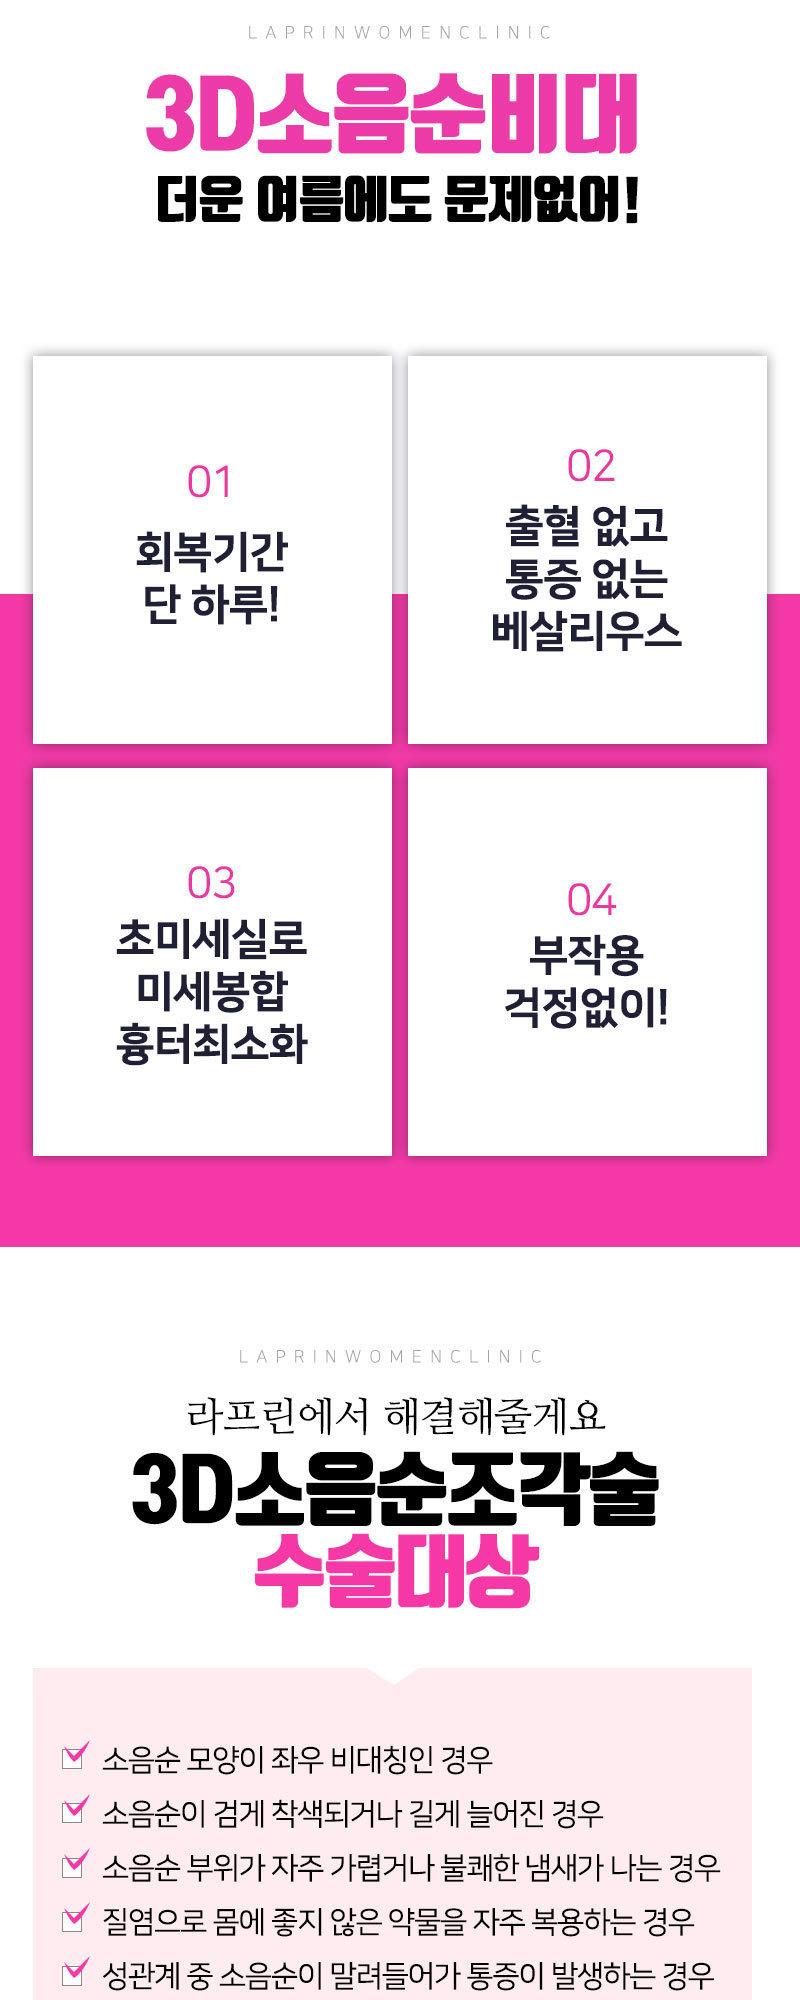 D event info 919f7b0eea66824da4